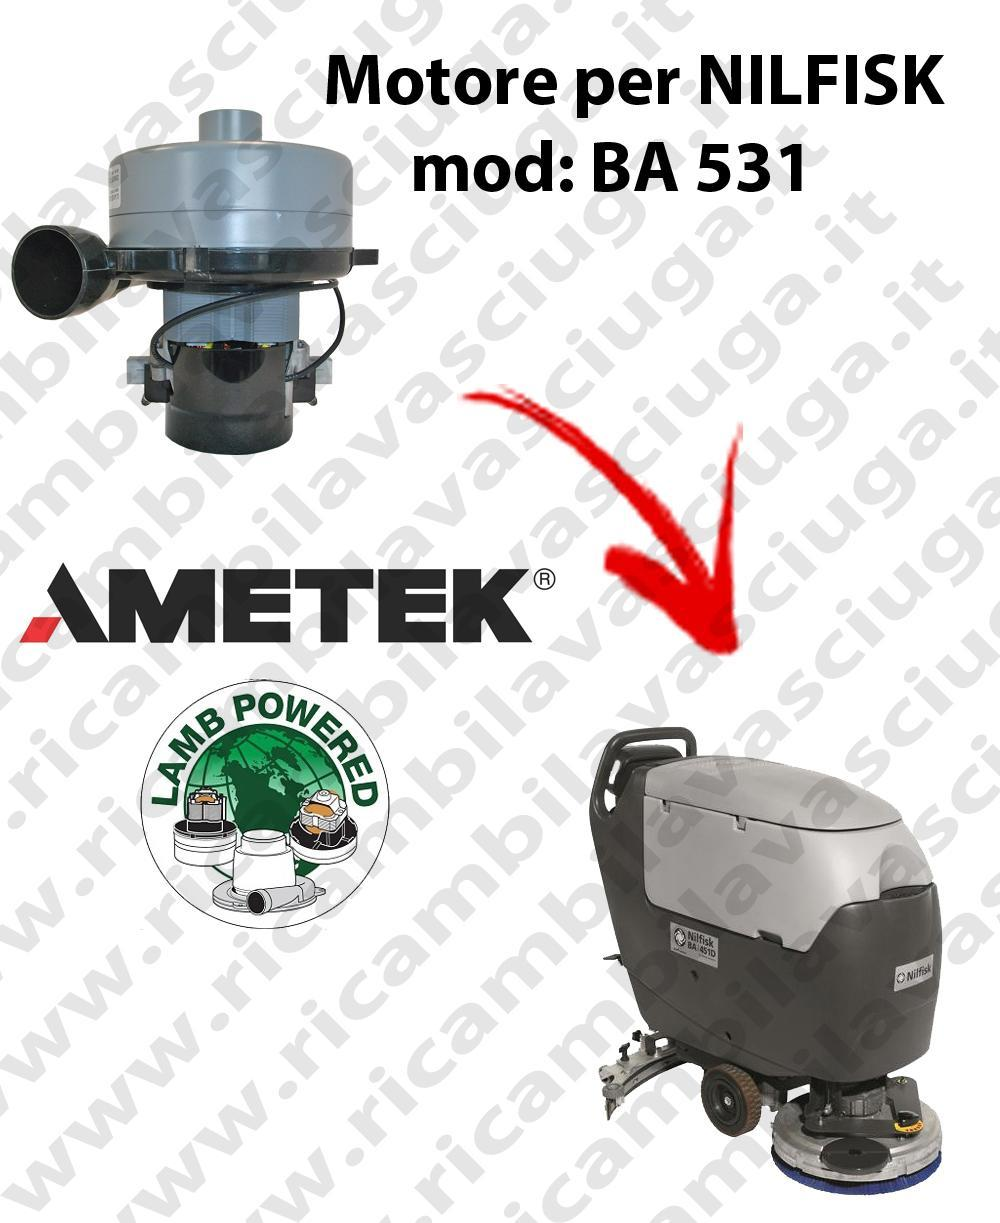 BA 531 Saugmotor LAMB AMETEK für scheuersaugmaschinen NILFISK